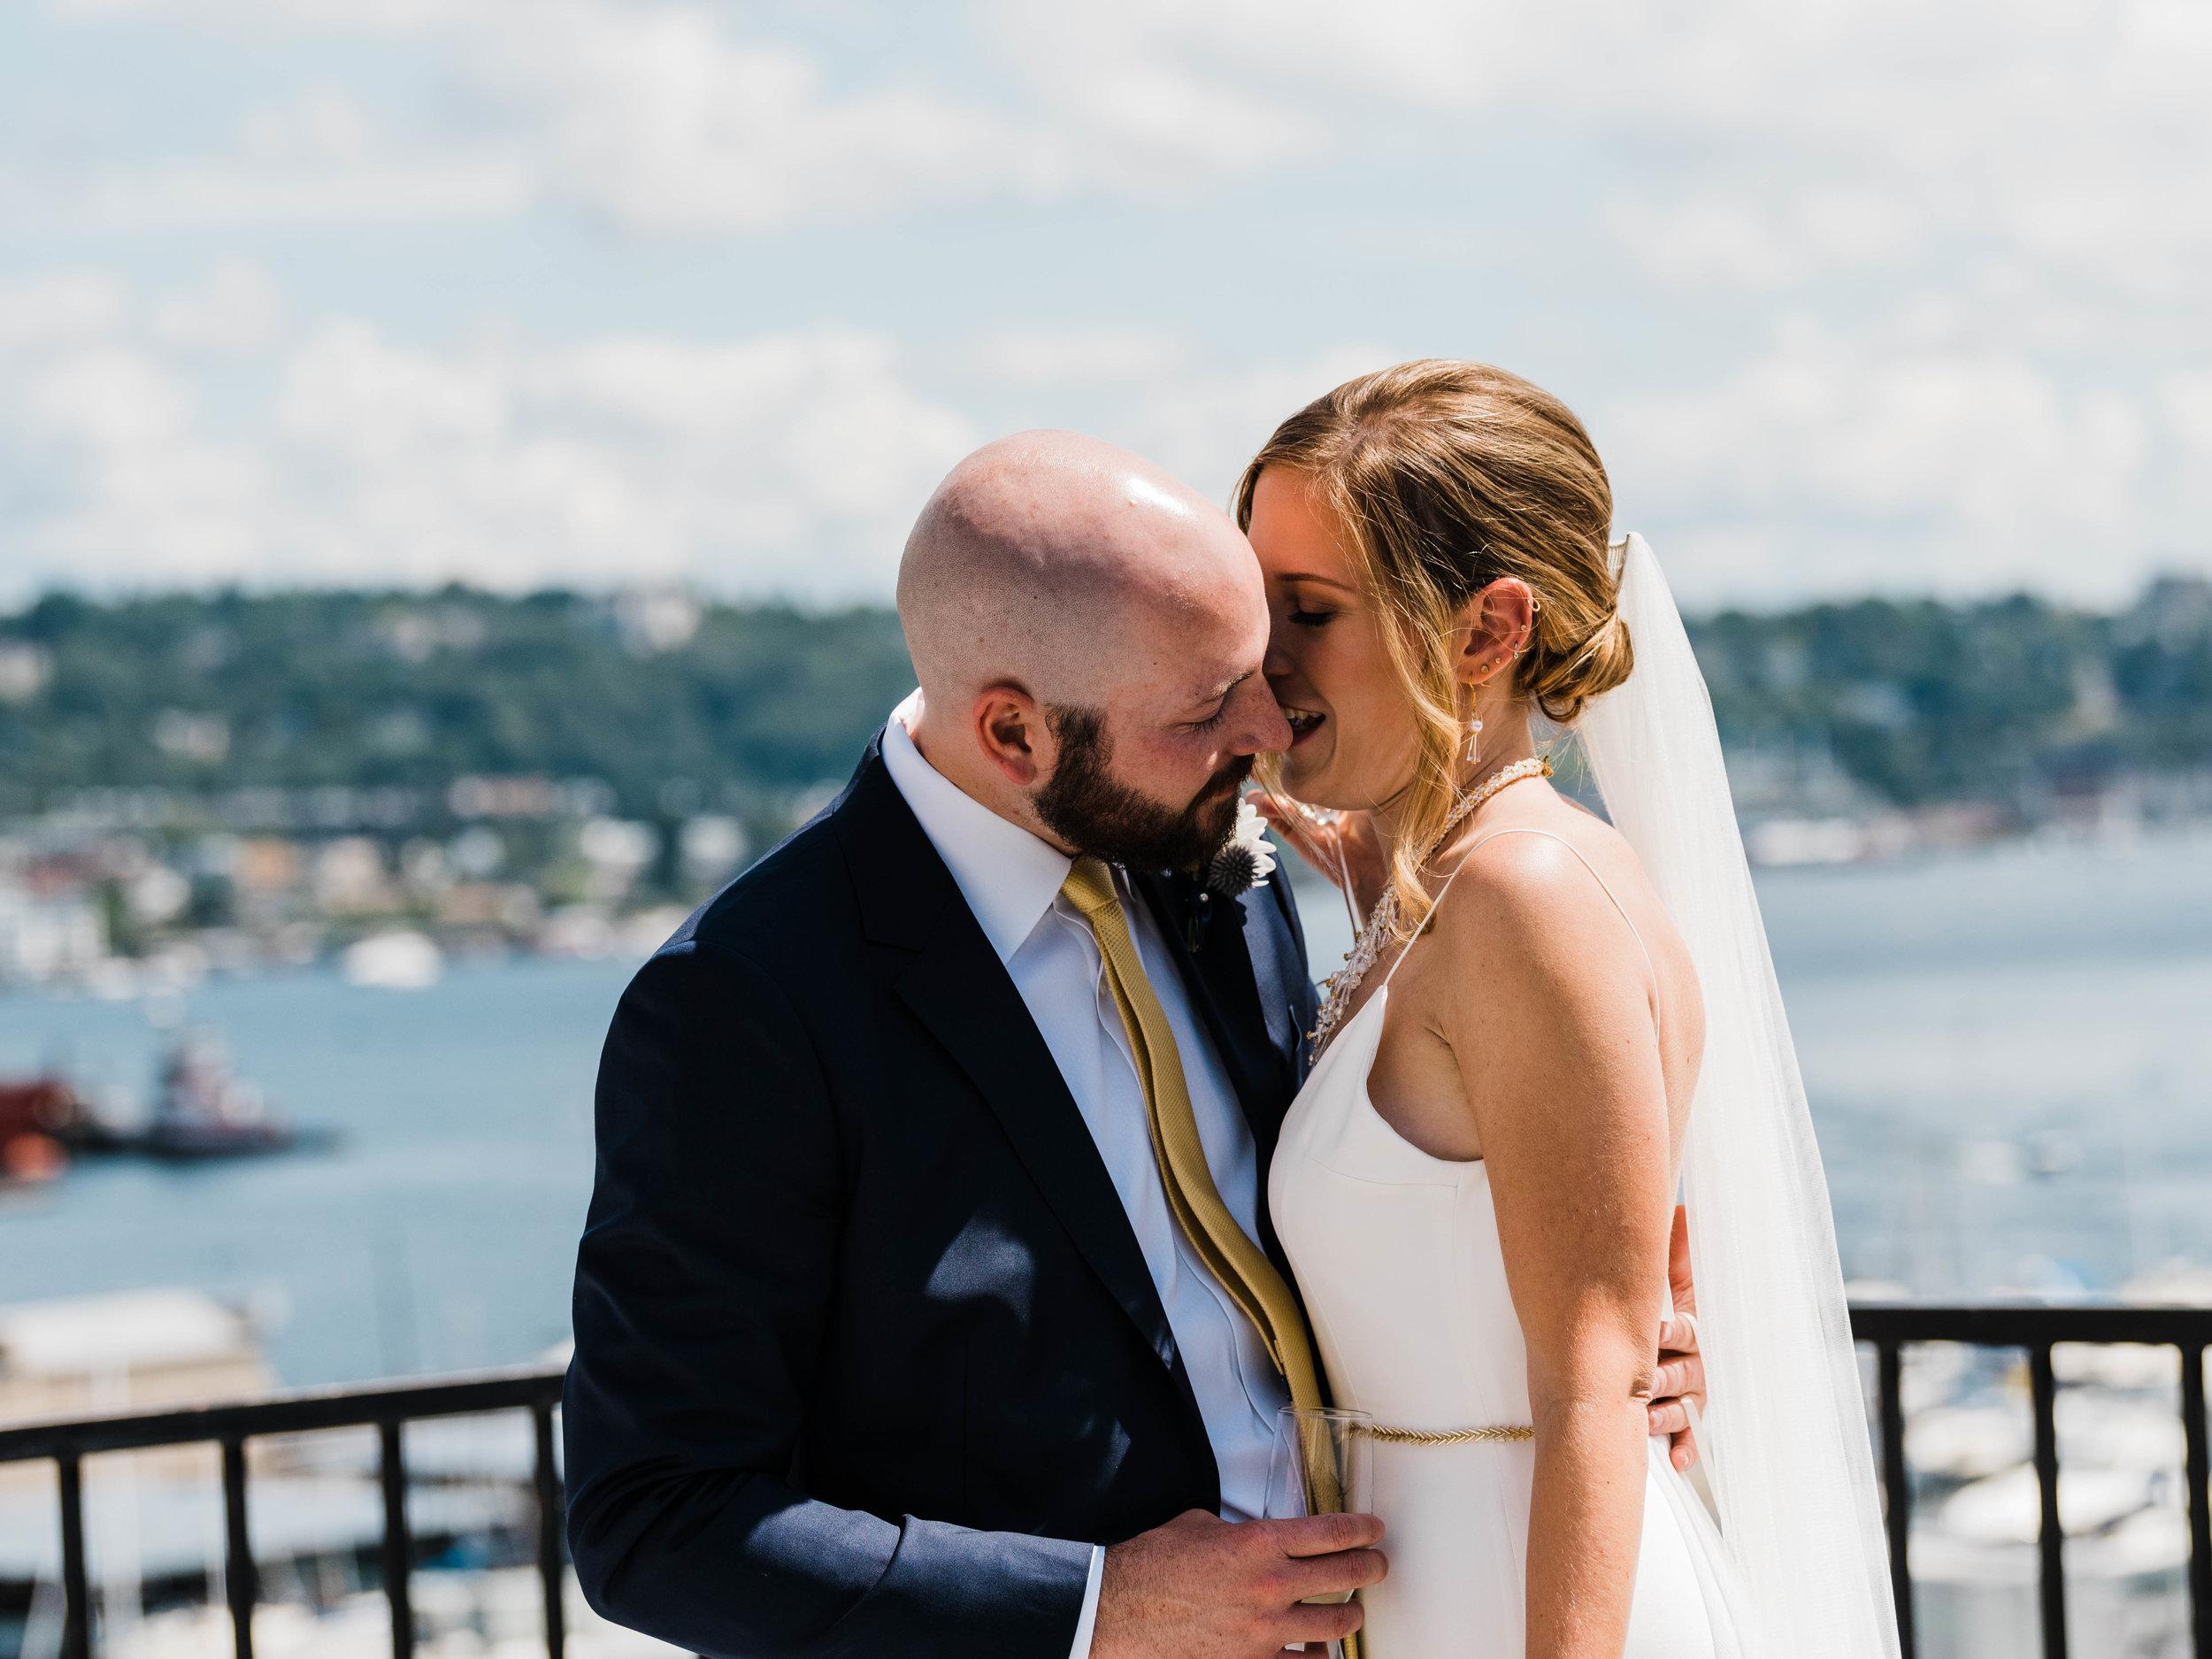 Seattle Wedding- MV Skansonia - Anna + Josh -  (458) - Copy.jpg